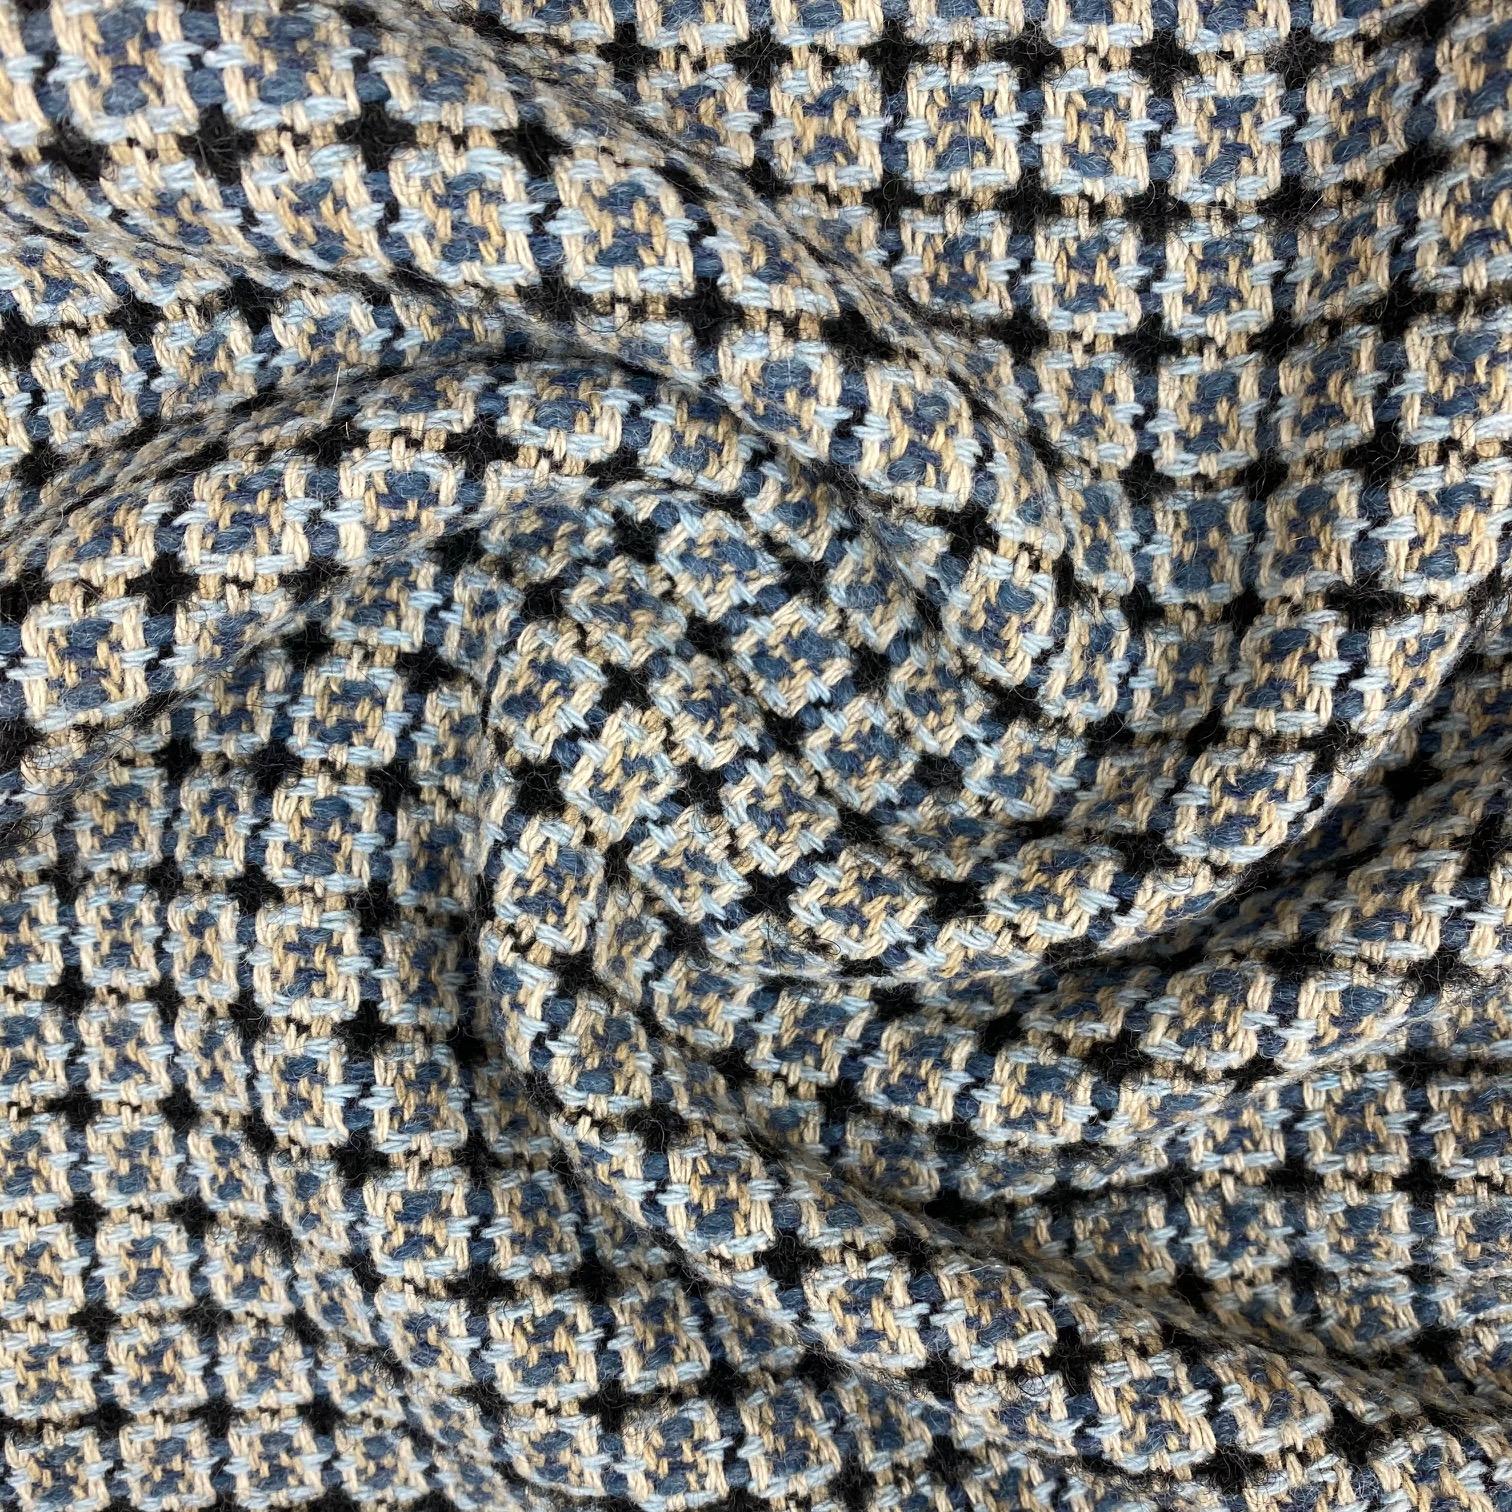 Mantelstoff, Buntgewebe Wolle, blau/hellblau. Art. 3332-04